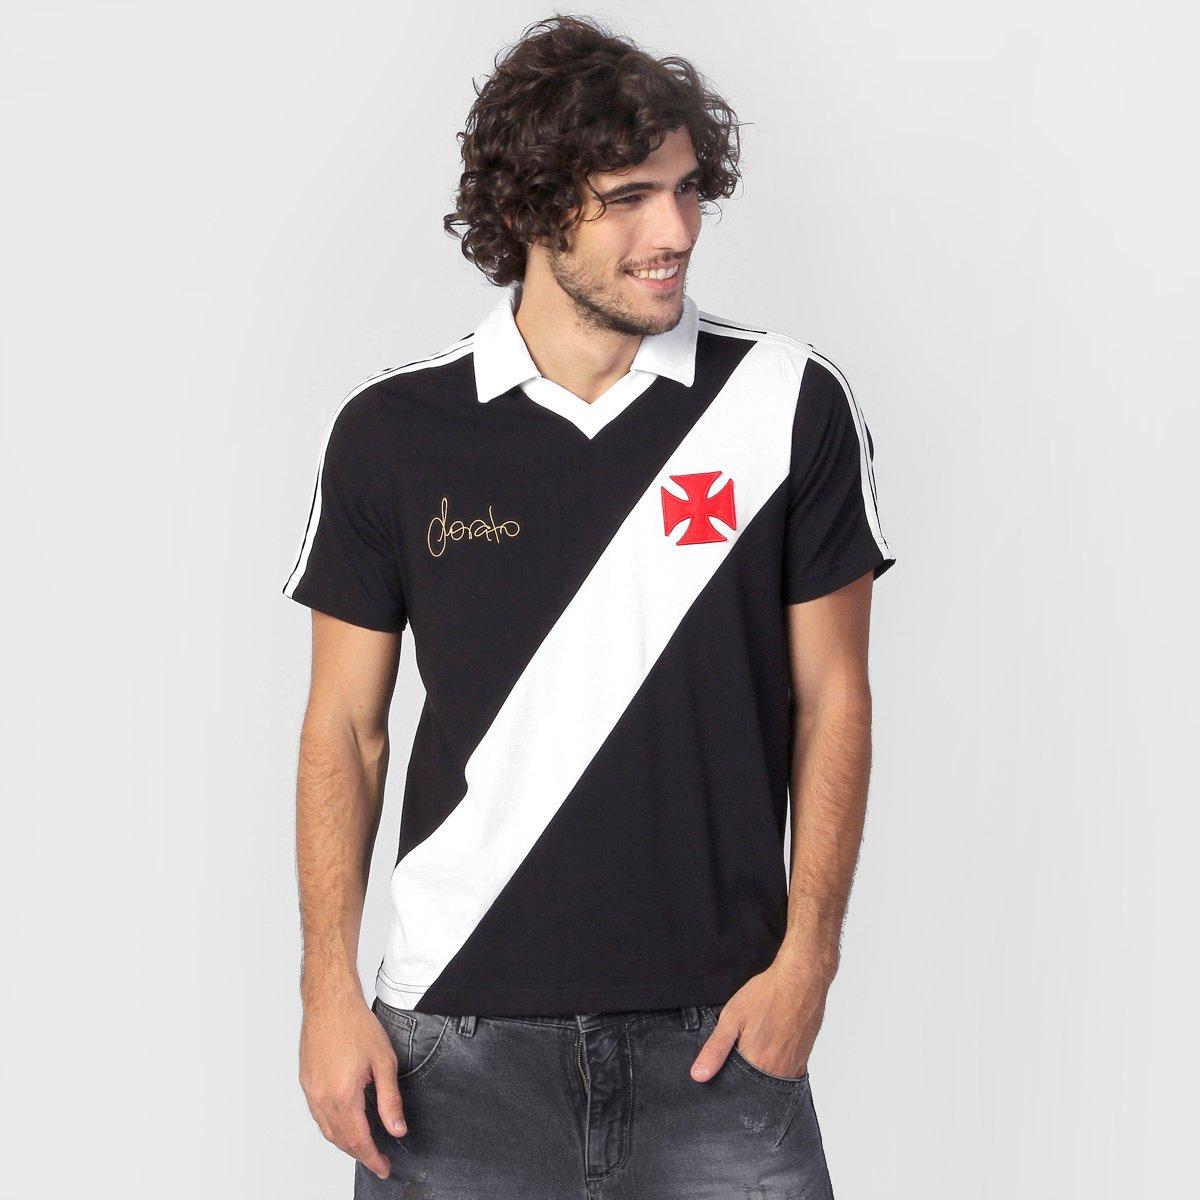 Camisa Polo Vasco Sorato - Retrô - Compre Agora  cf0941e2e2207